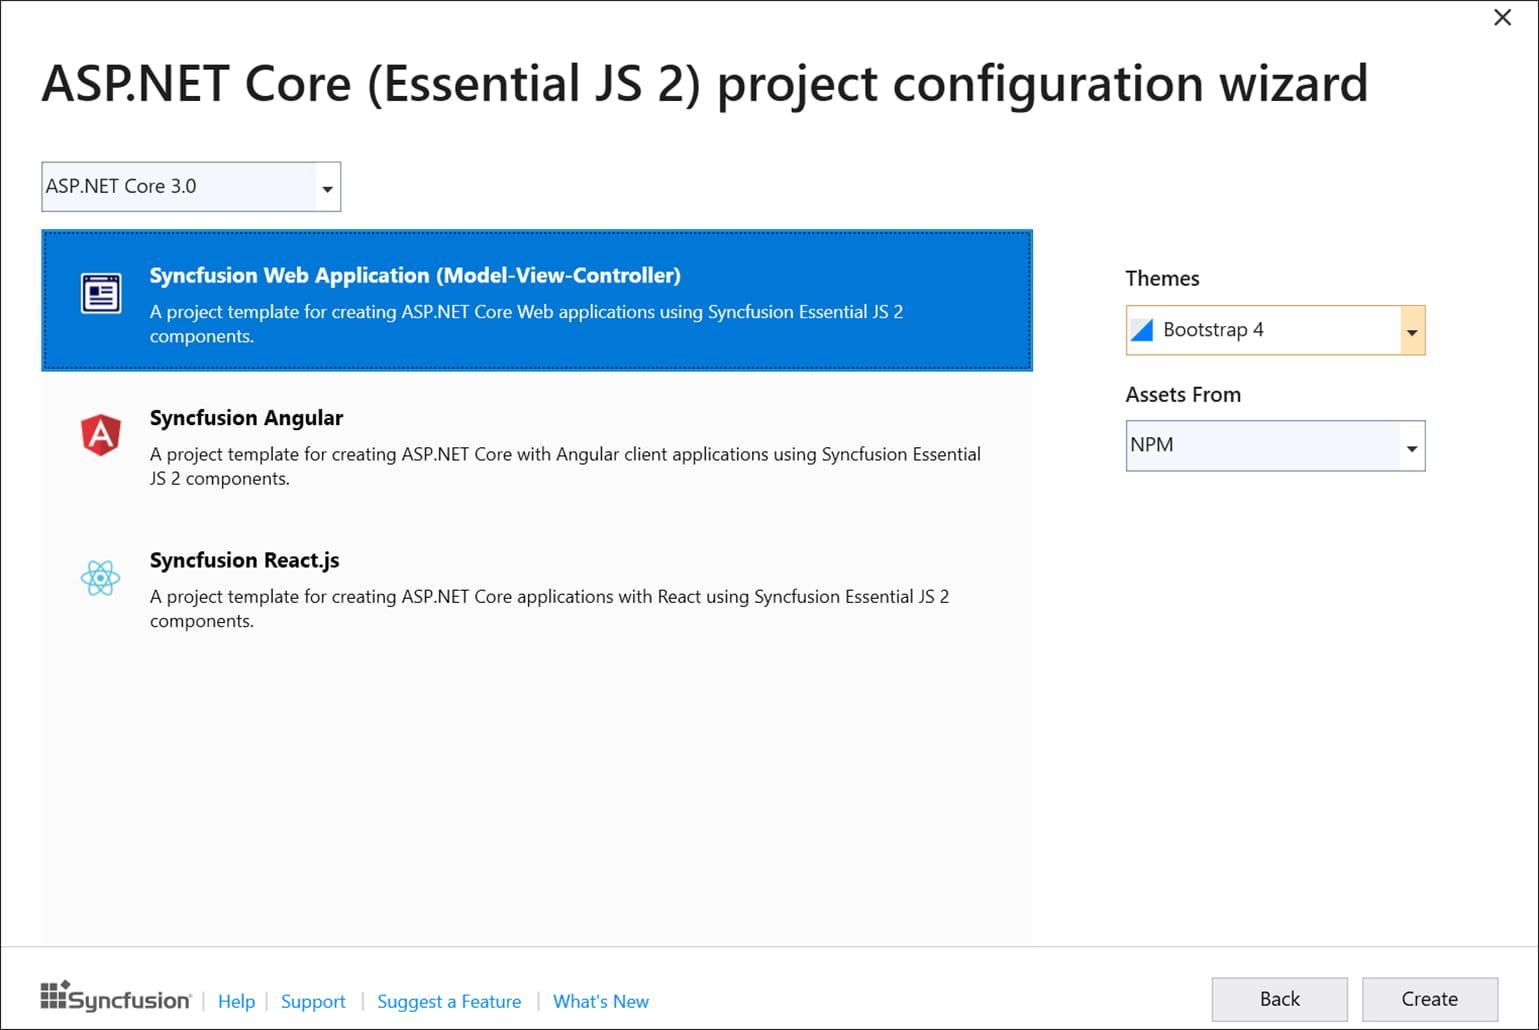 Project Templates | ASP NET Core (Essential JS 2) | Syncfusion